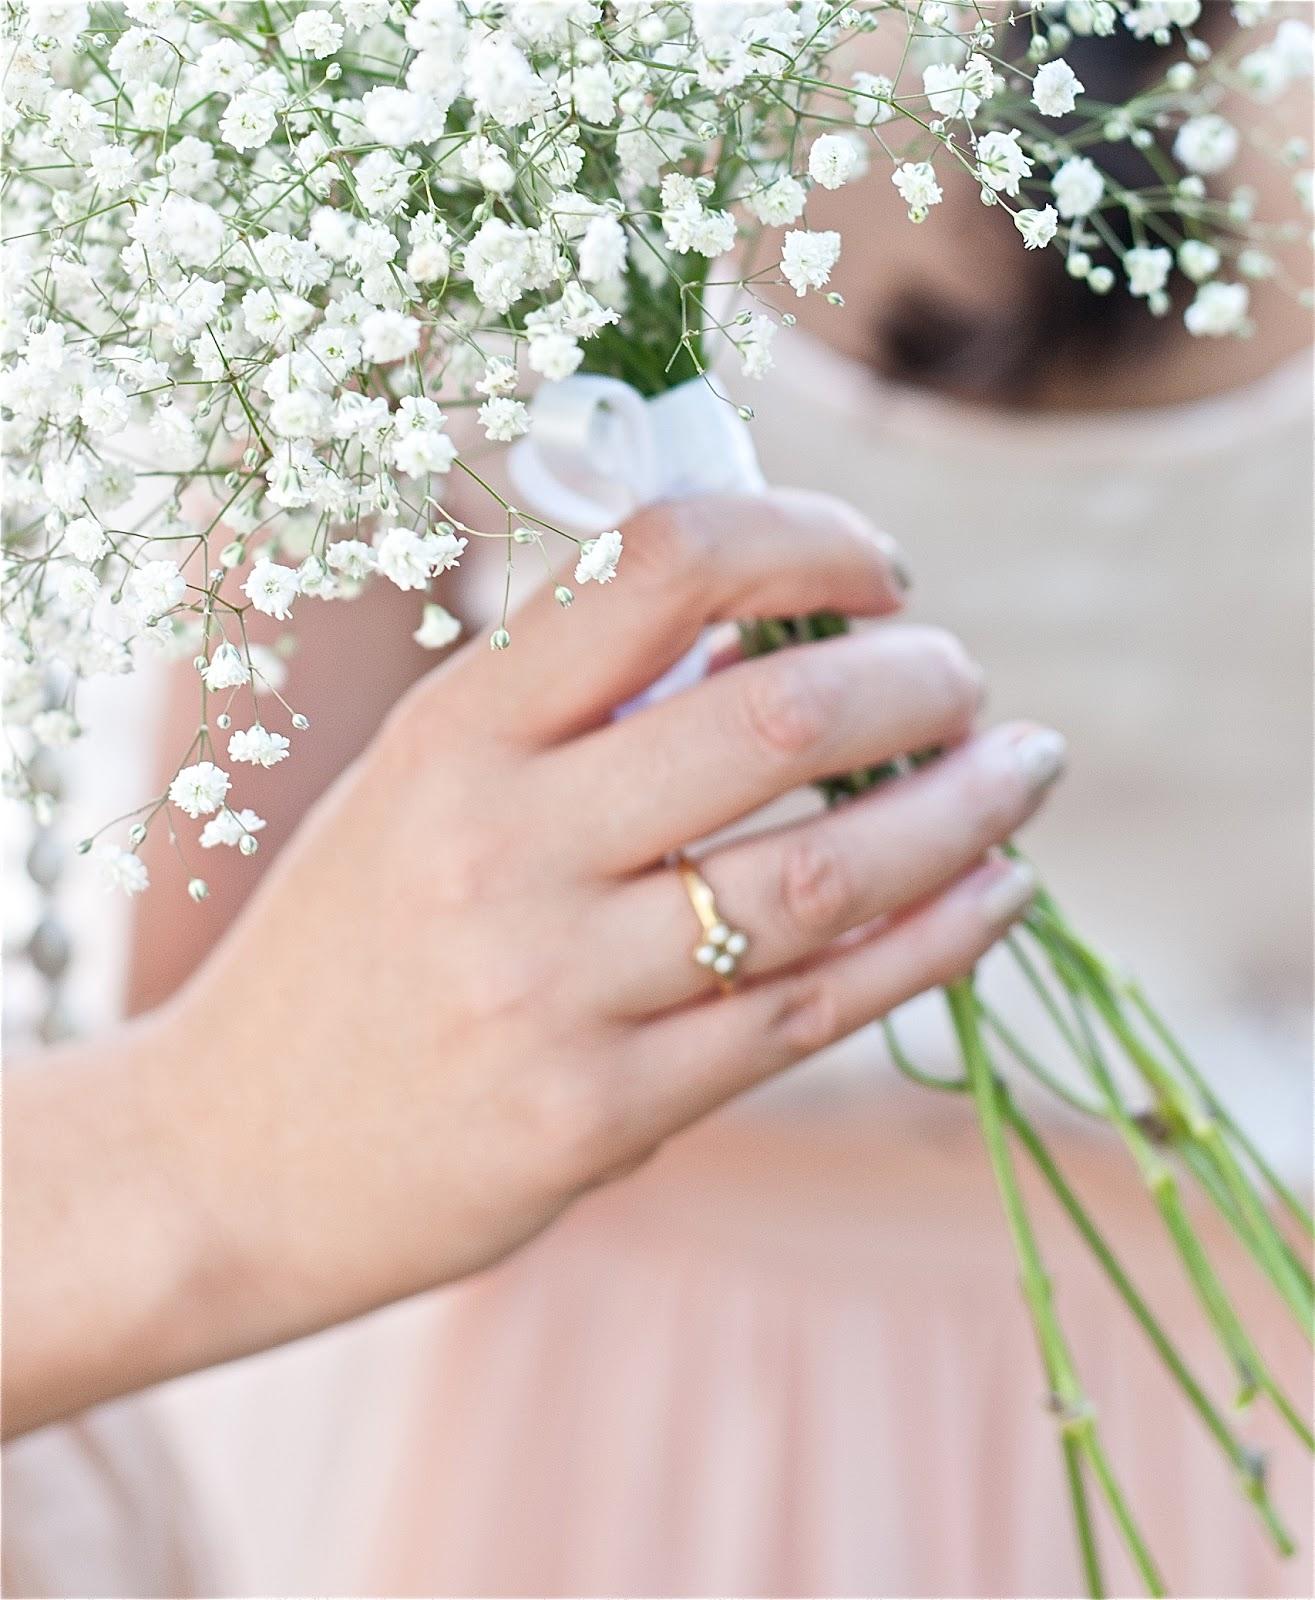 18th century wedding rings